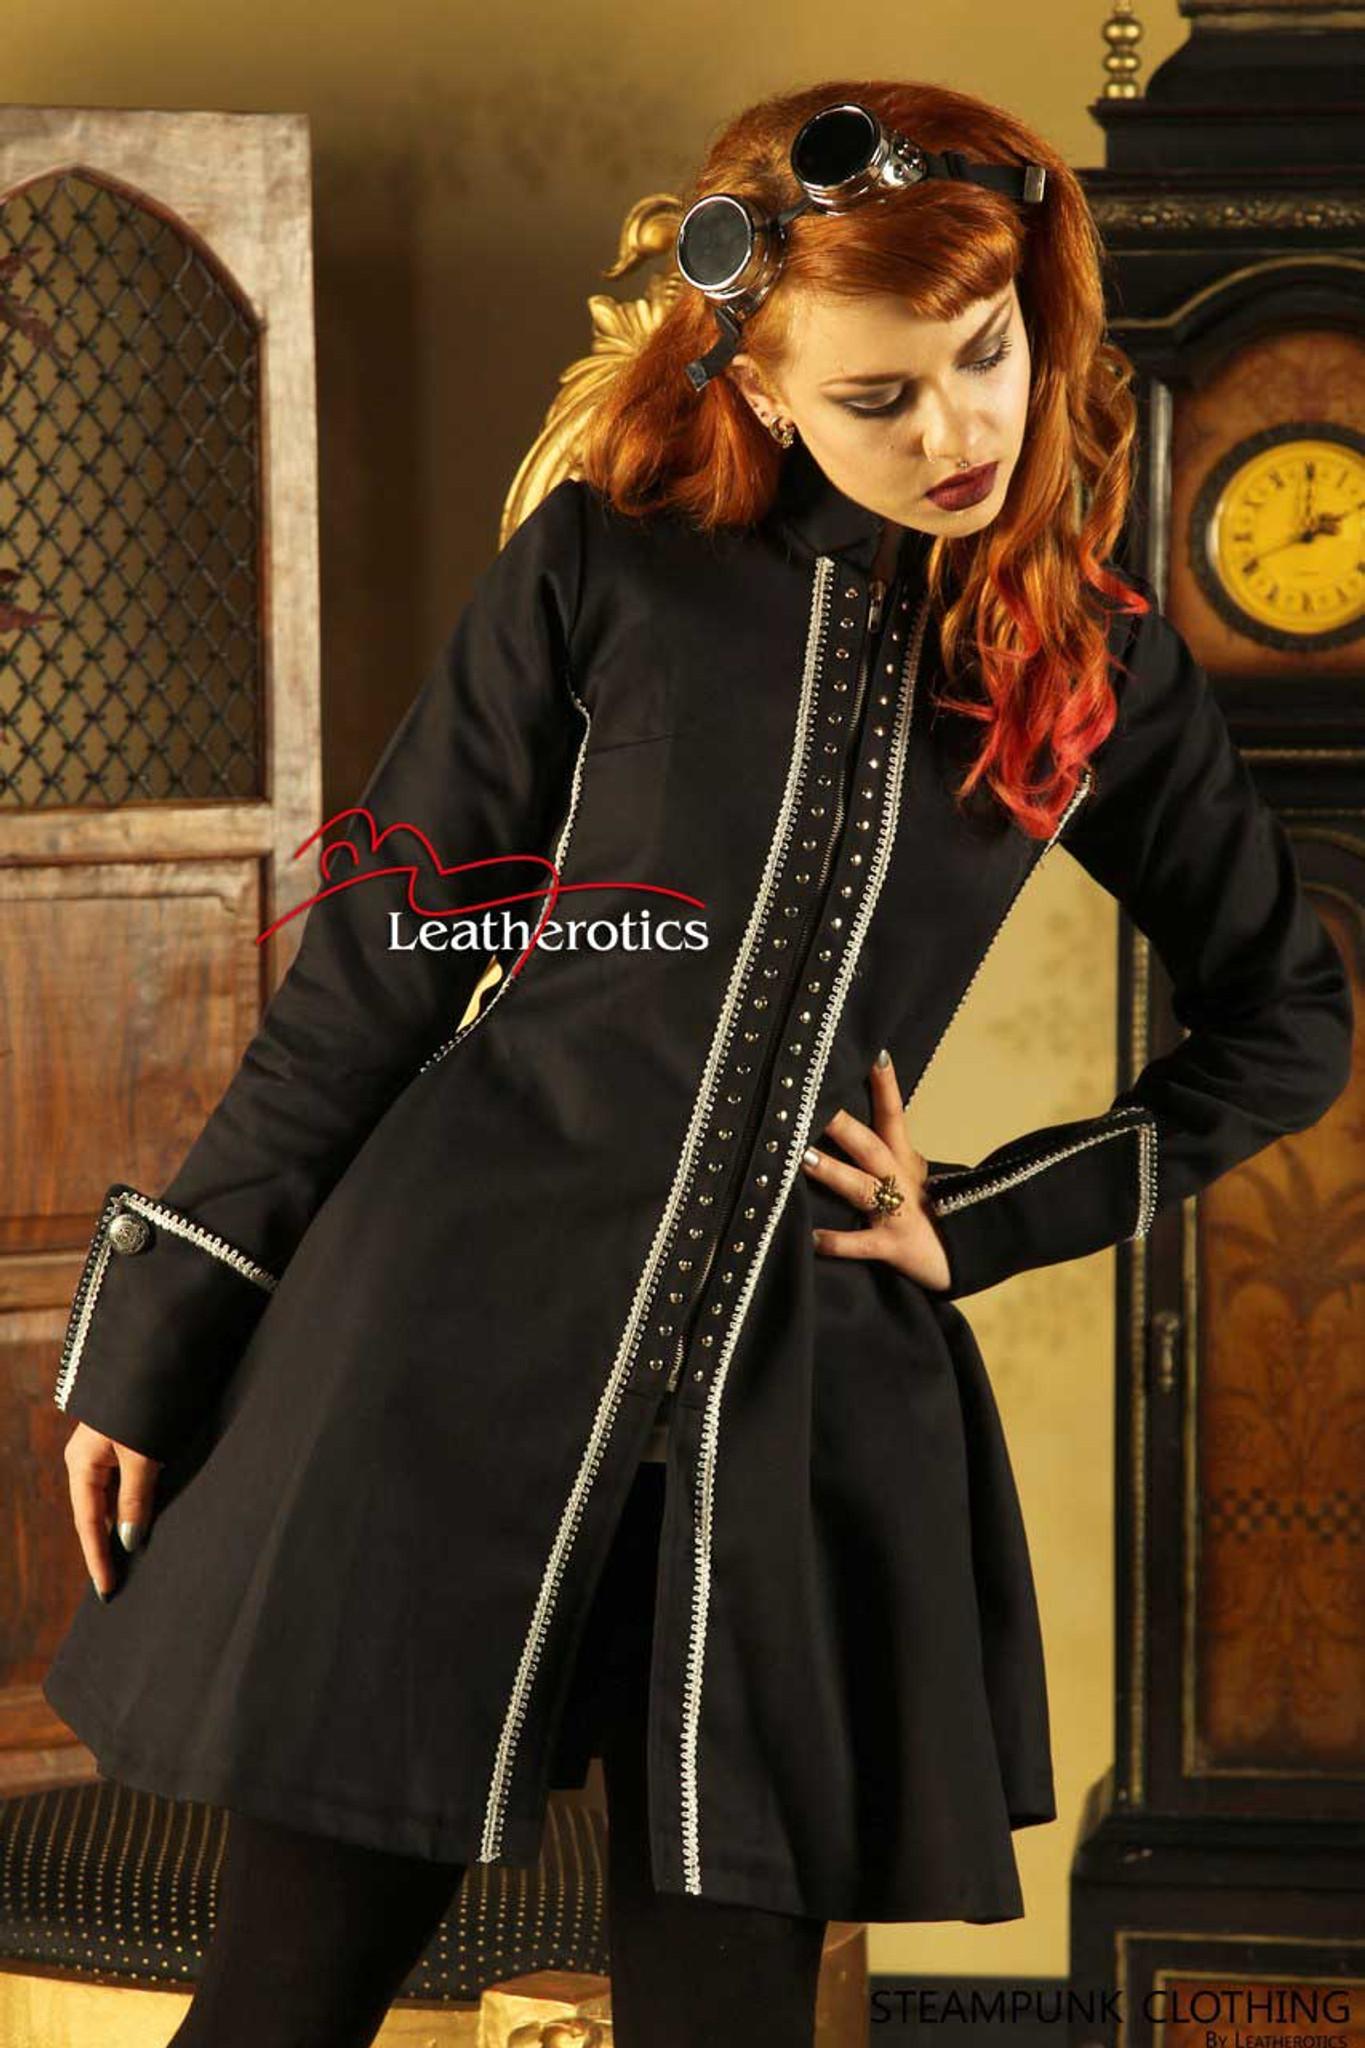 steampunk clothing | victorian jacket top | steampunk ...  steampunk cloth...